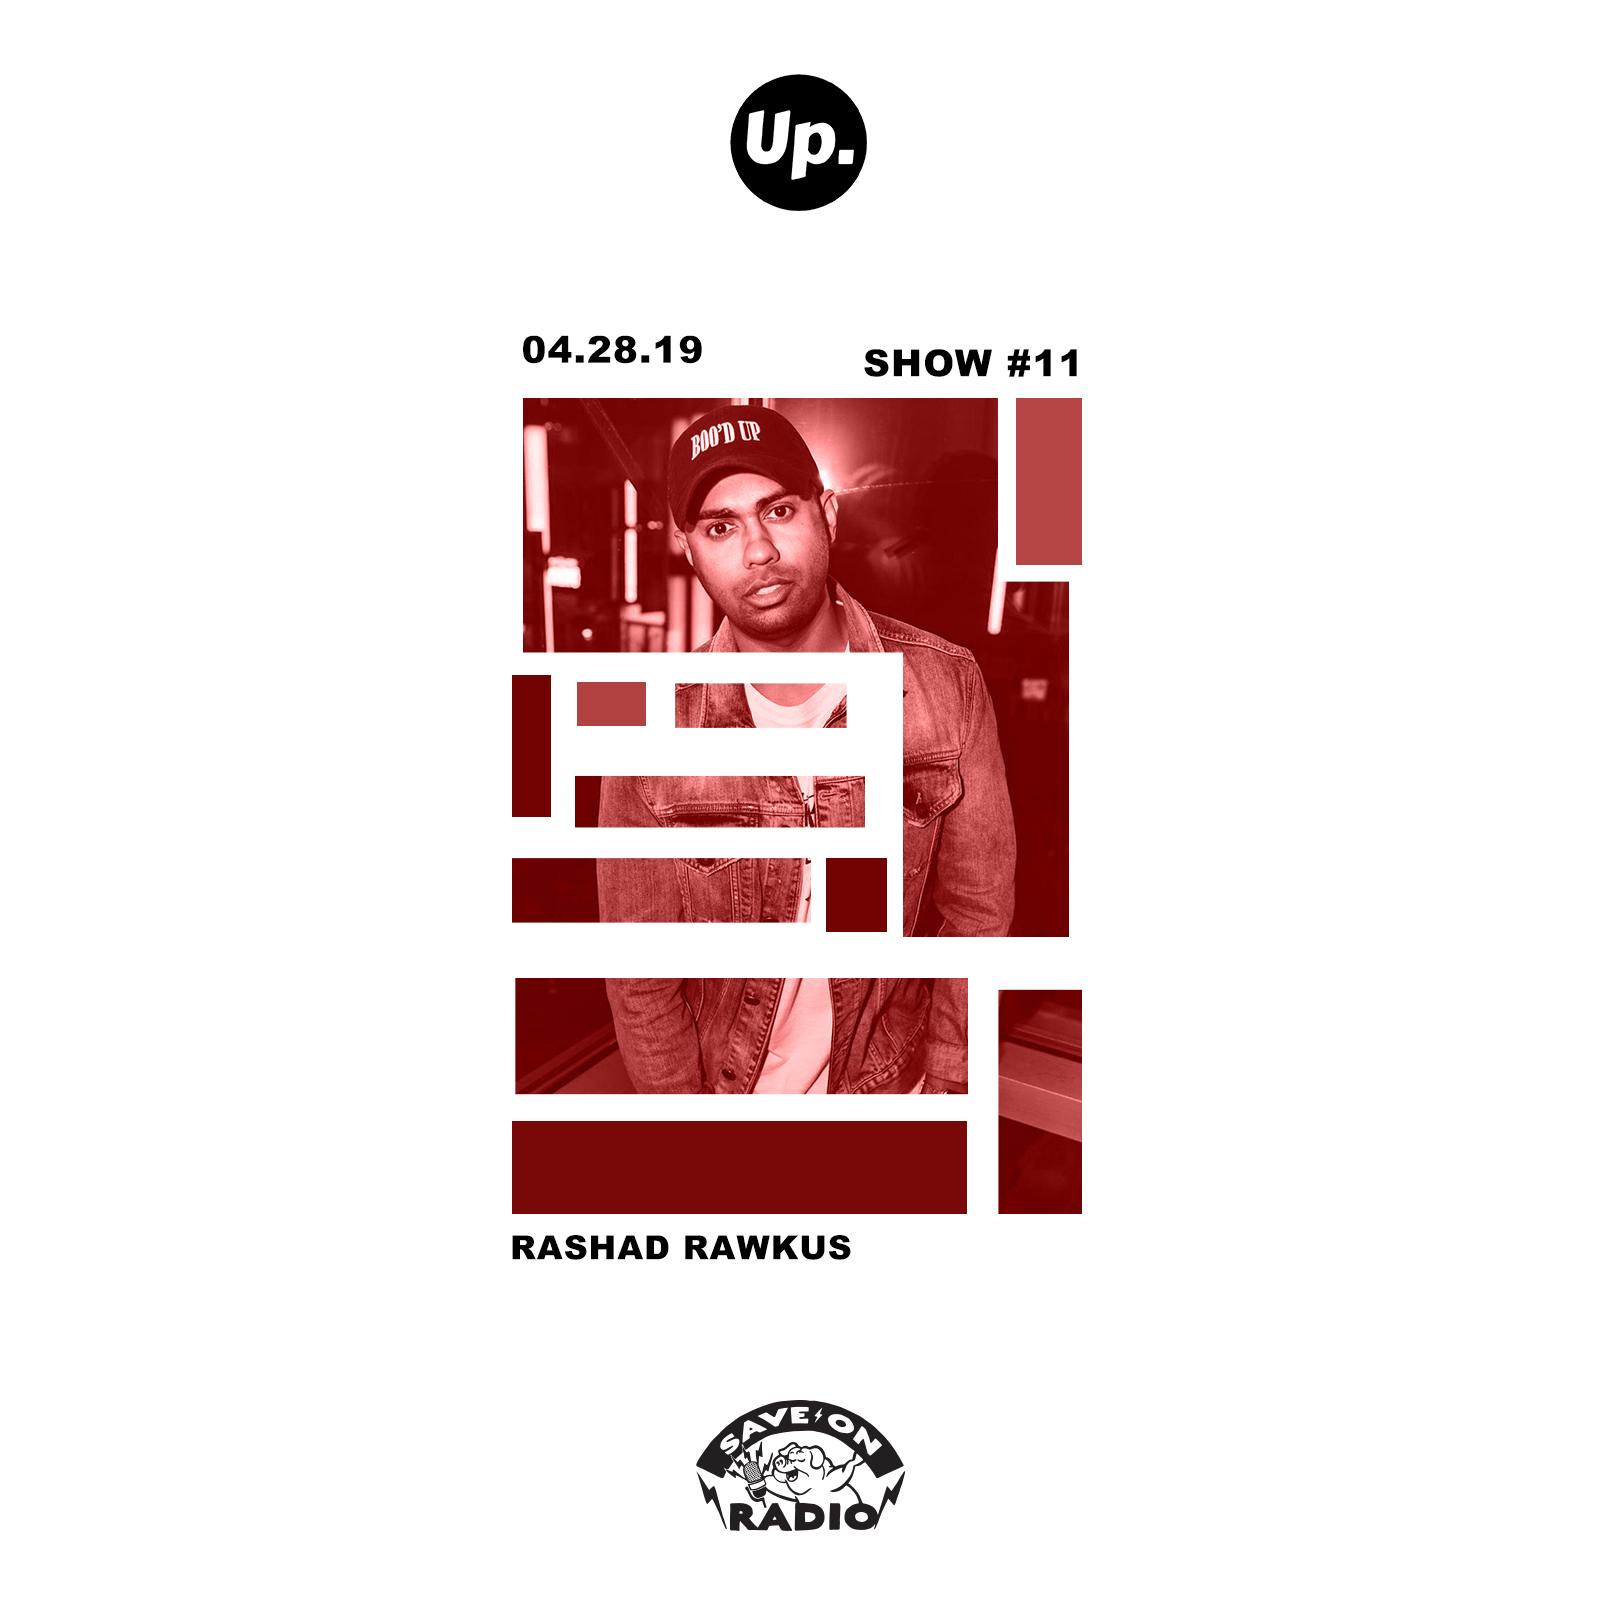 Show #11 featuring Rashad Rawkus